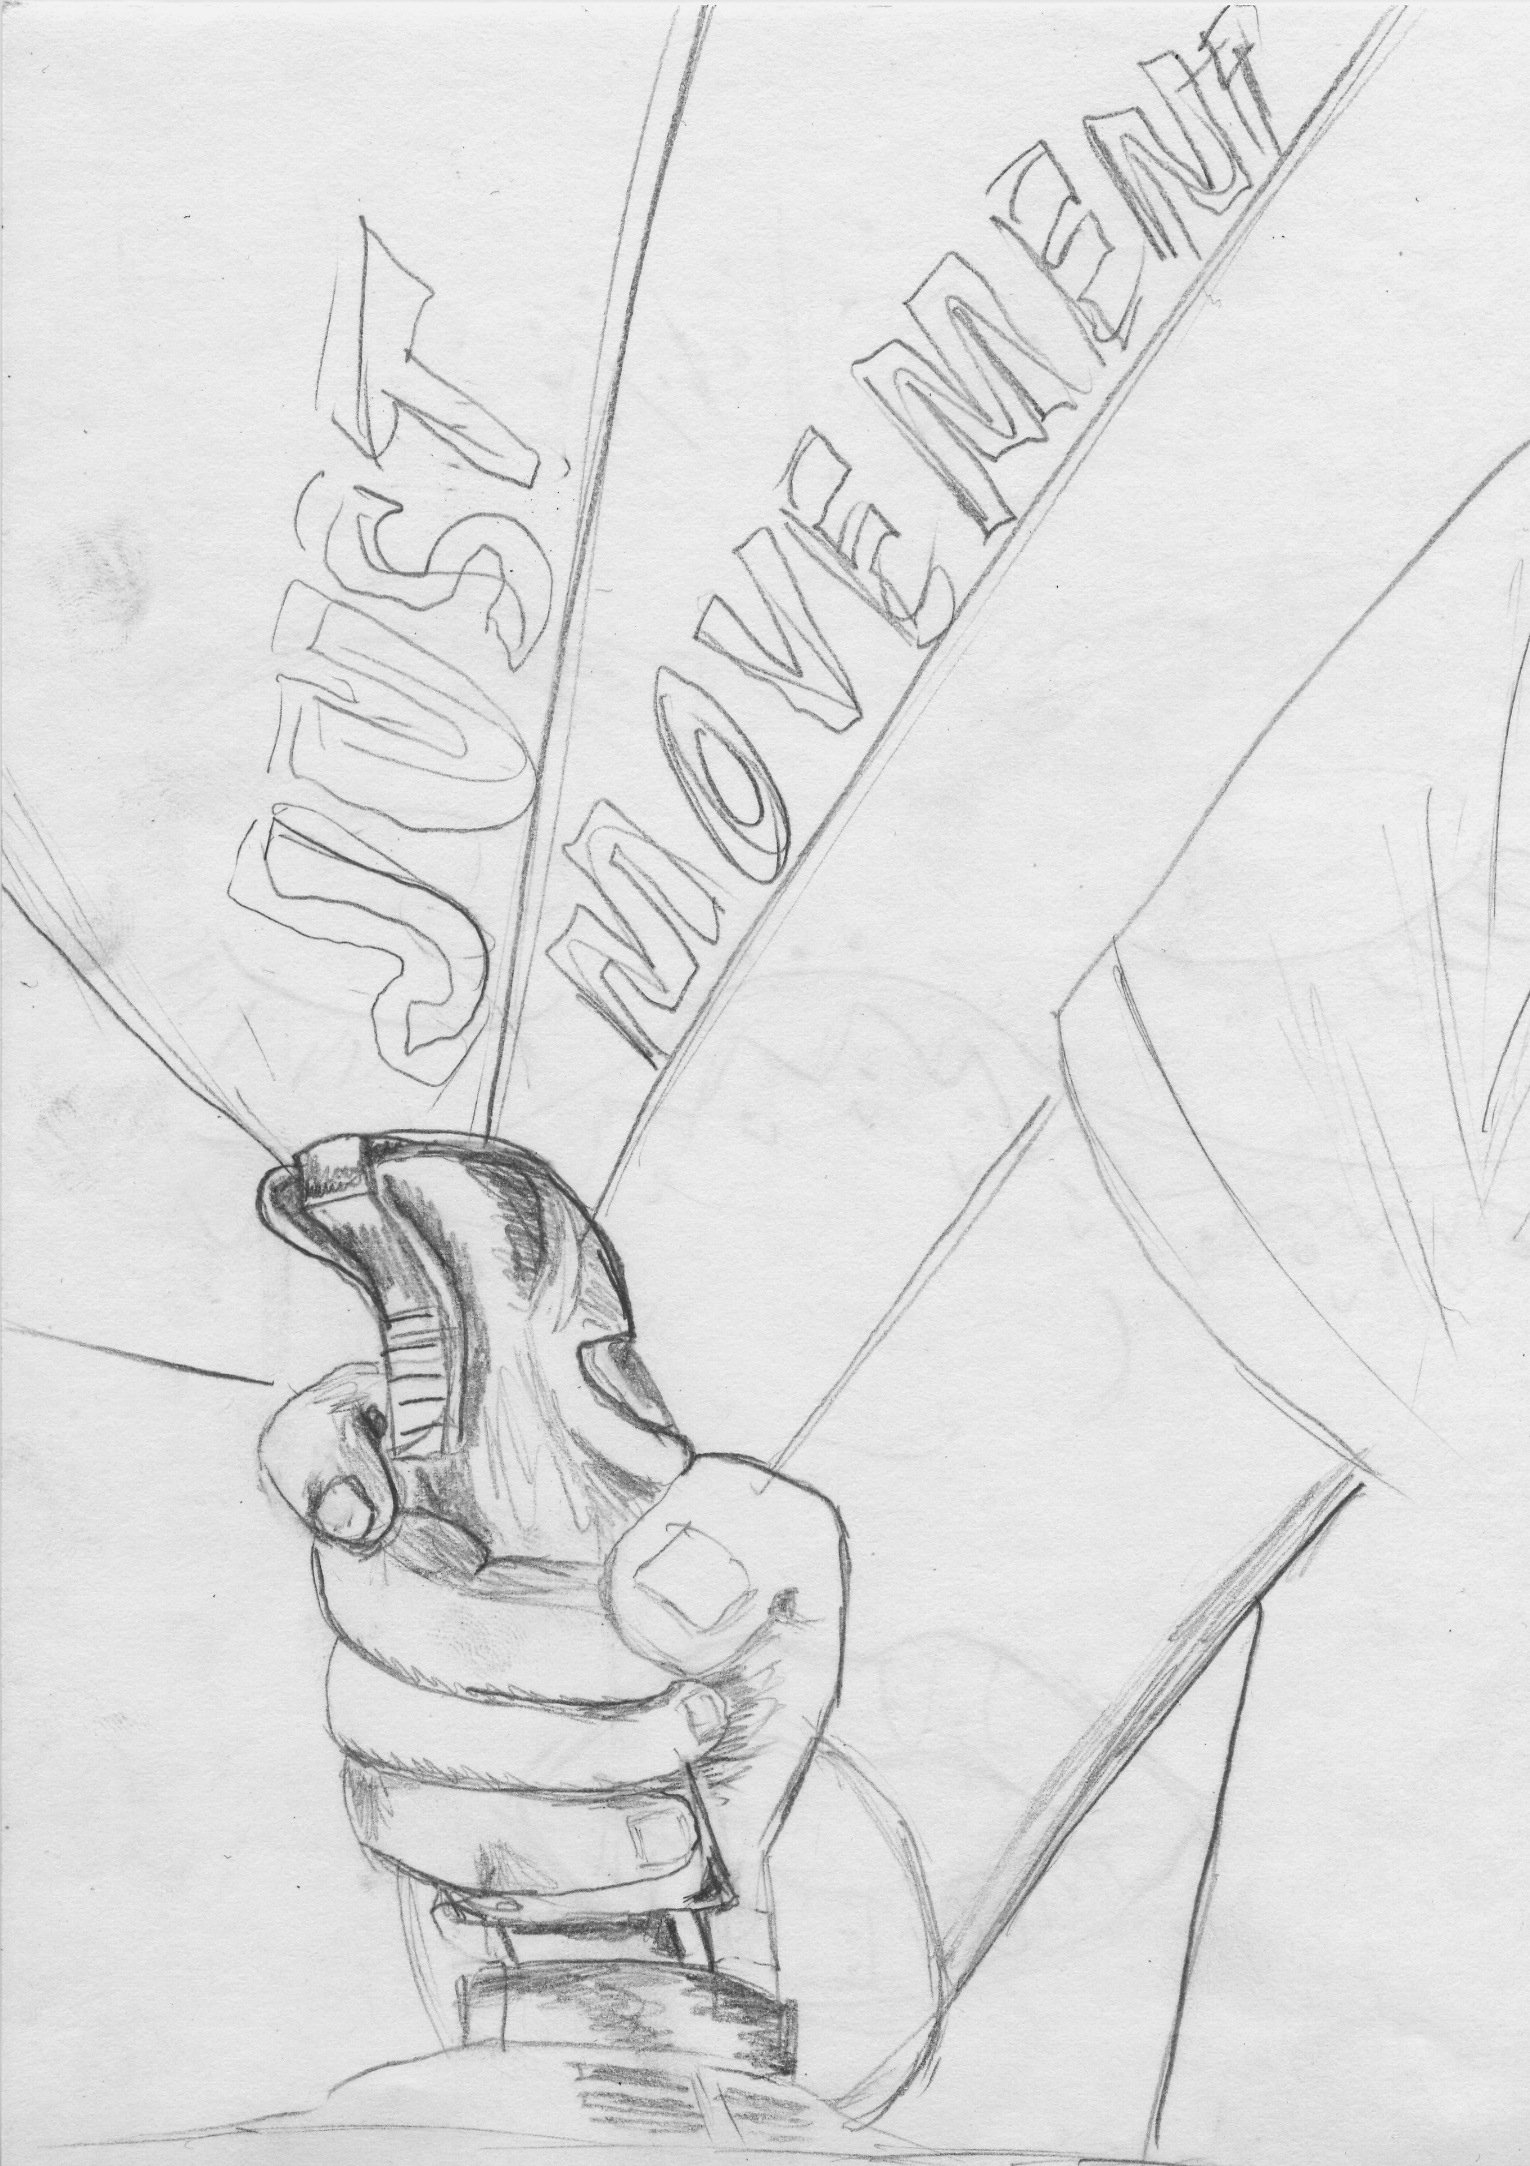 Robert DeLong : Just Movement Tour - image 16 - student project